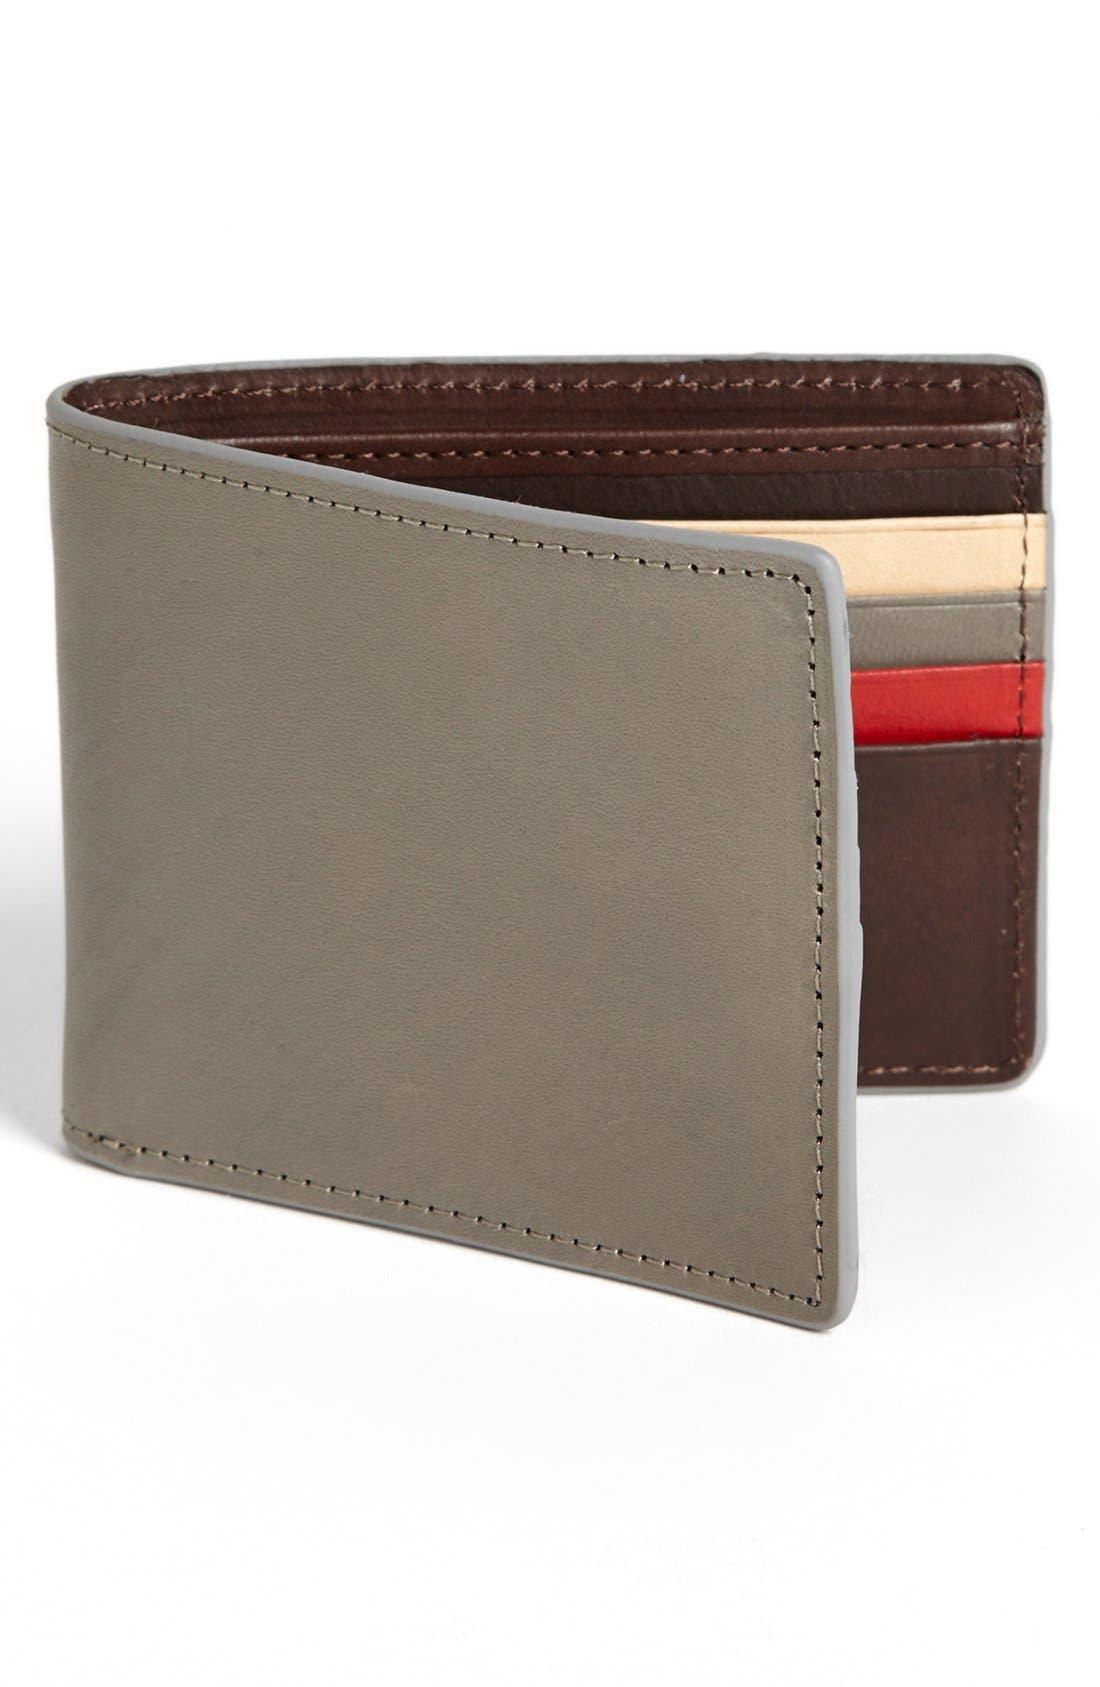 Alternate Image 1 Selected - J Fold 'Havana' Slim Fold Wallet